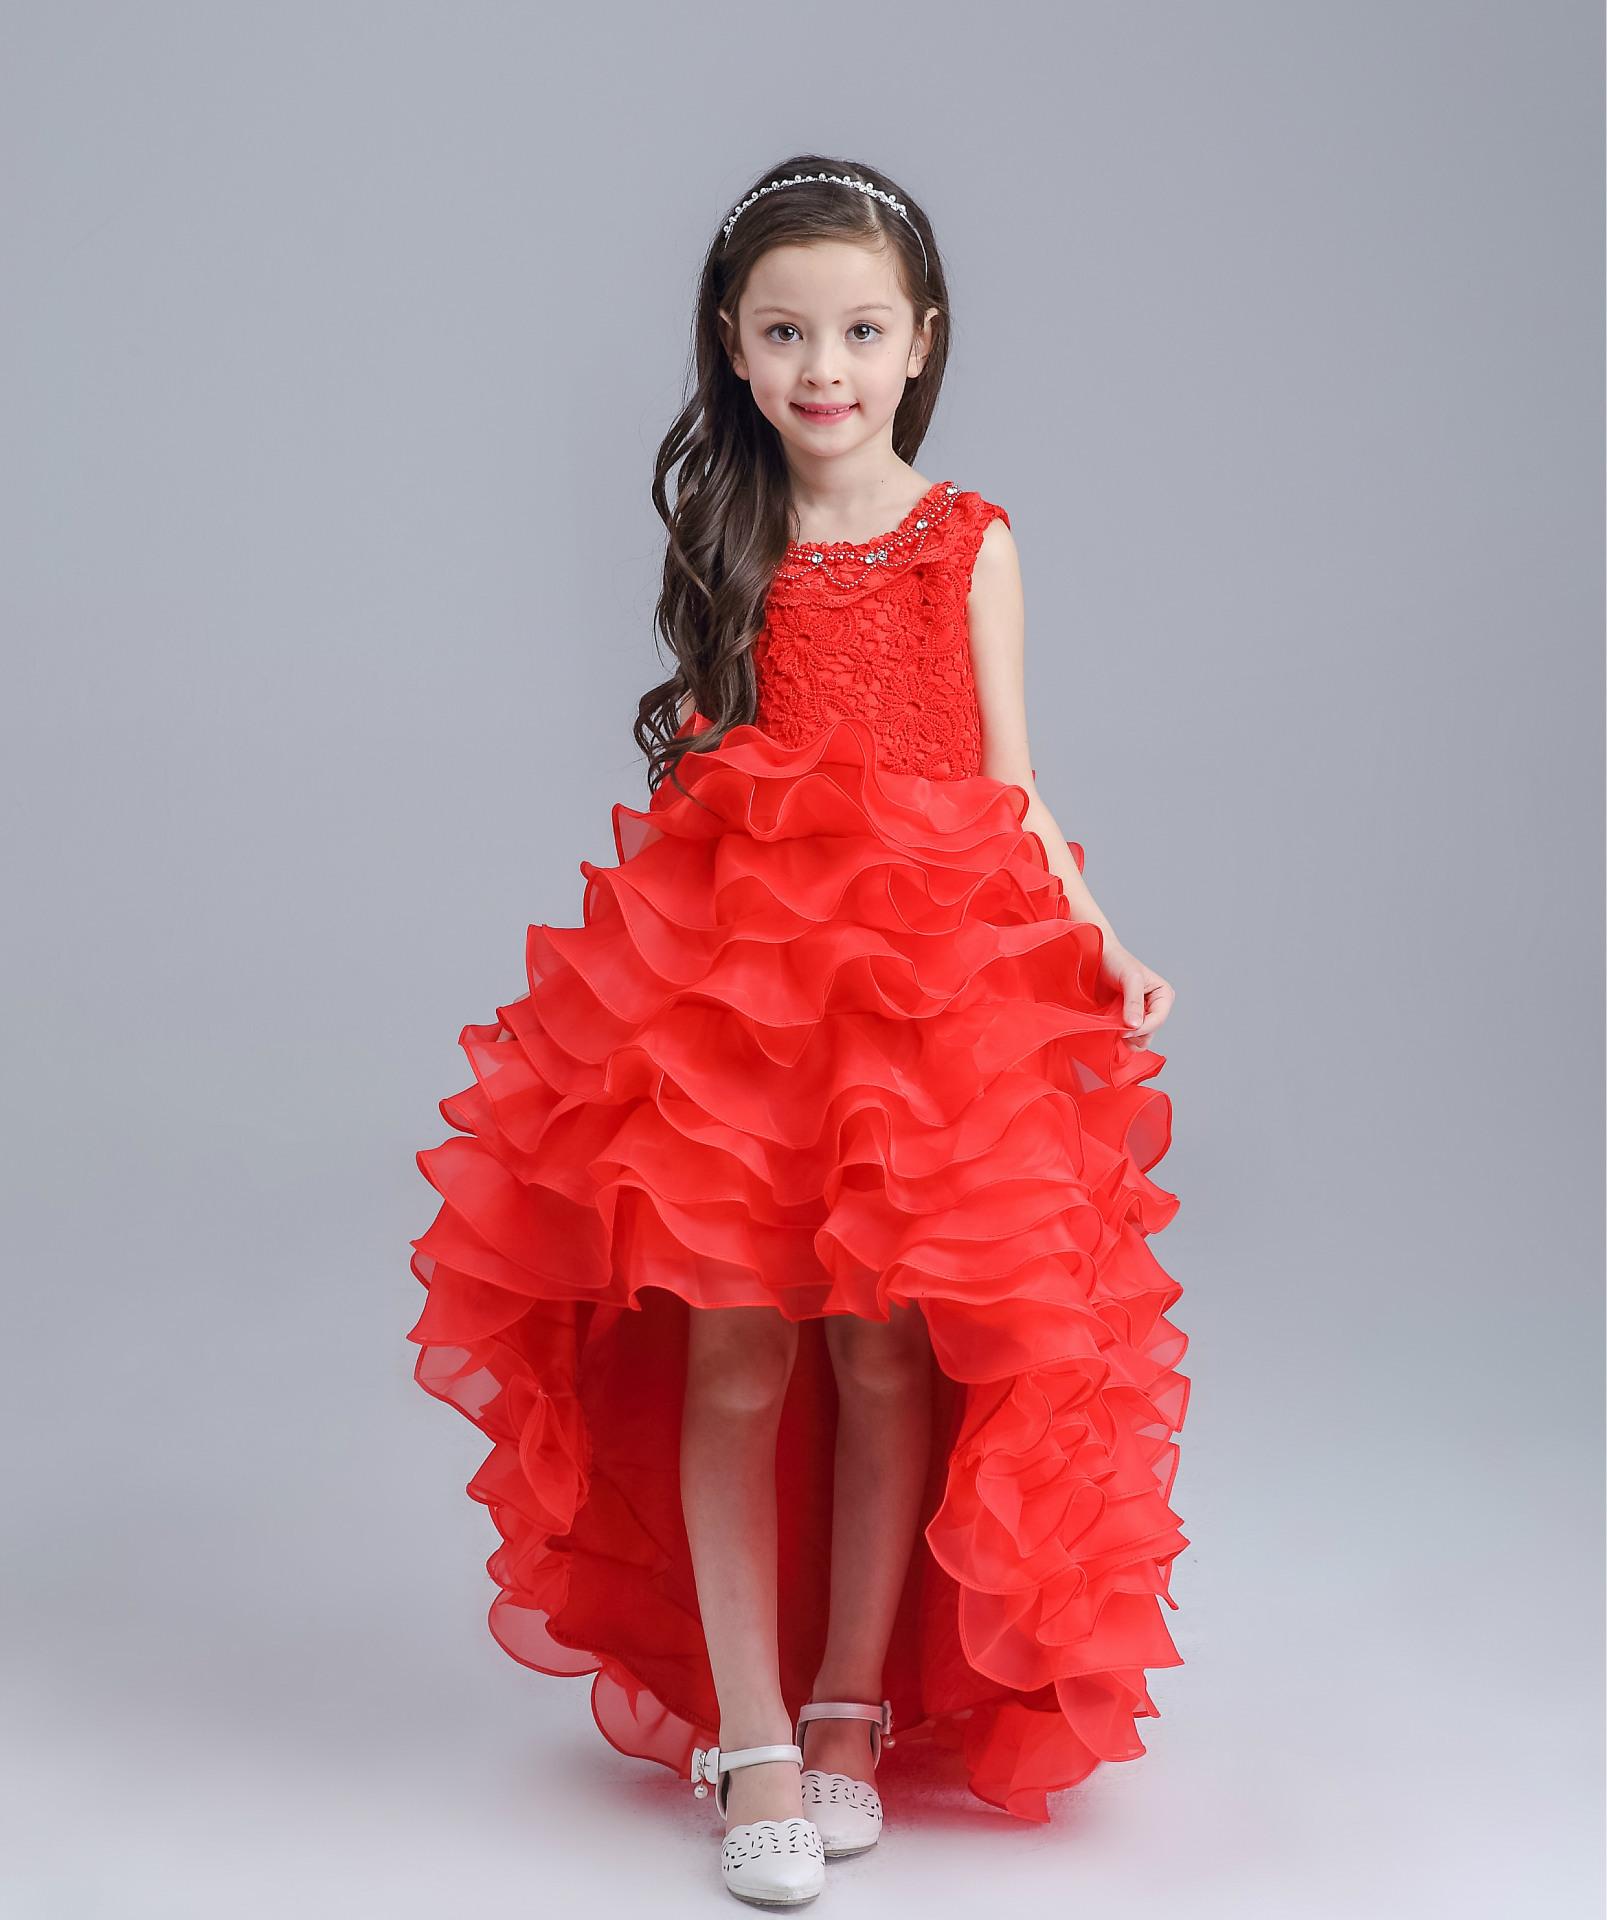 Teenage Long Tailed Girls Summer Dress Kids Girls Red White Wedding Dress Evening Gowns Children Birthday Dress Party Ball Gowns(China (Mainland))